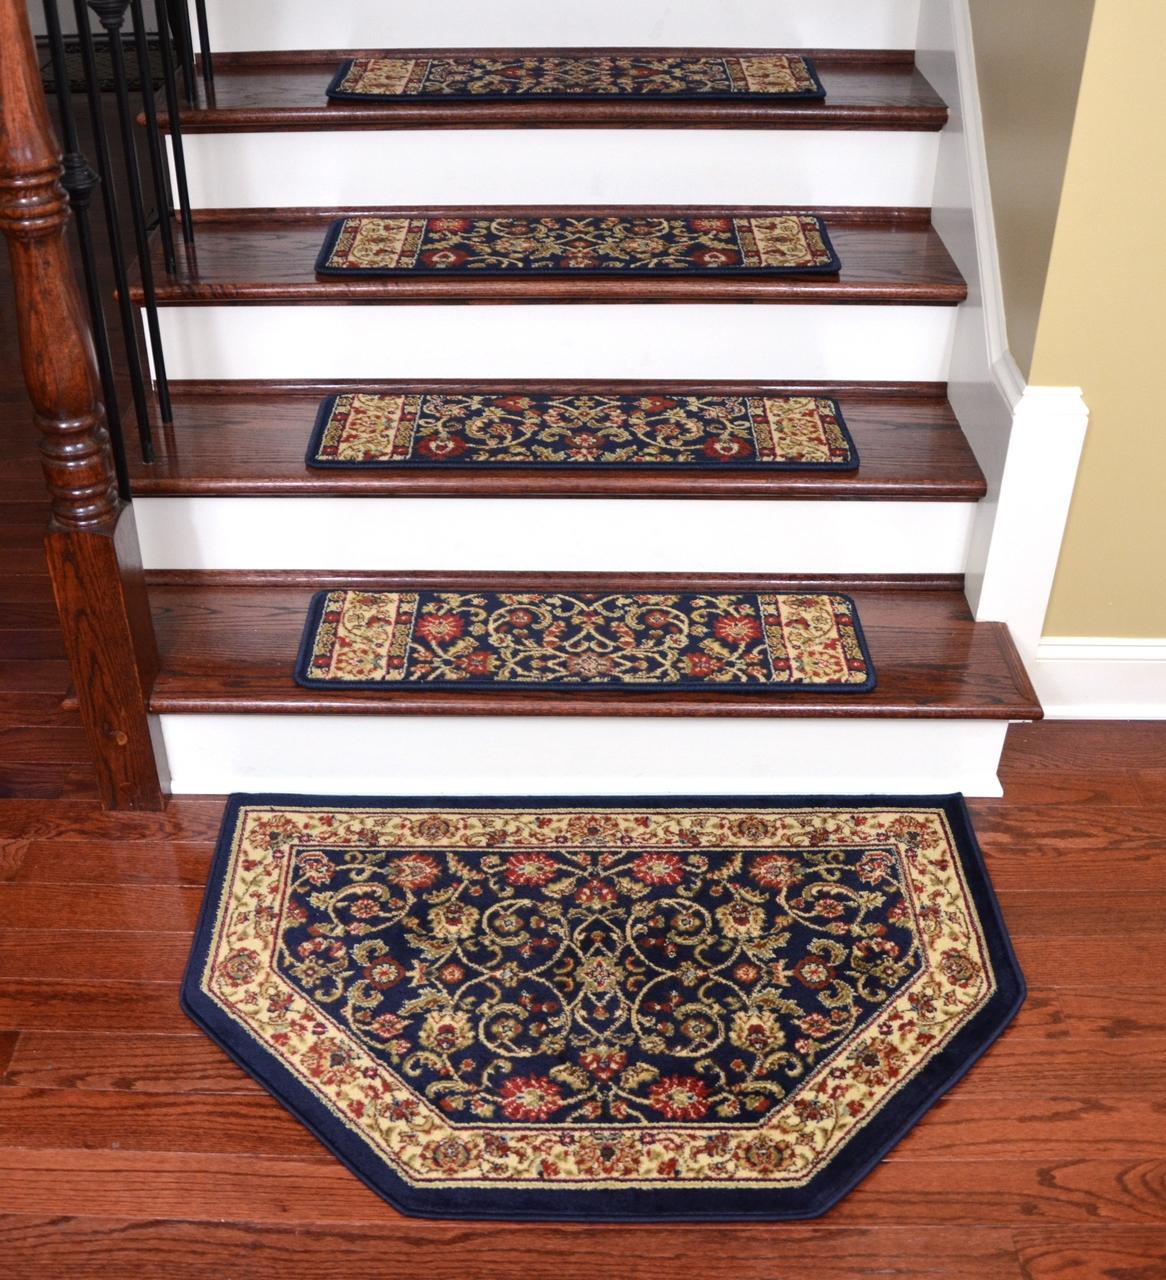 Rug Carpet Stair Treads Lowes Stair Tread Rugs Outdoor Stair For Carpet Stair Treads And Rugs (#13 of 20)